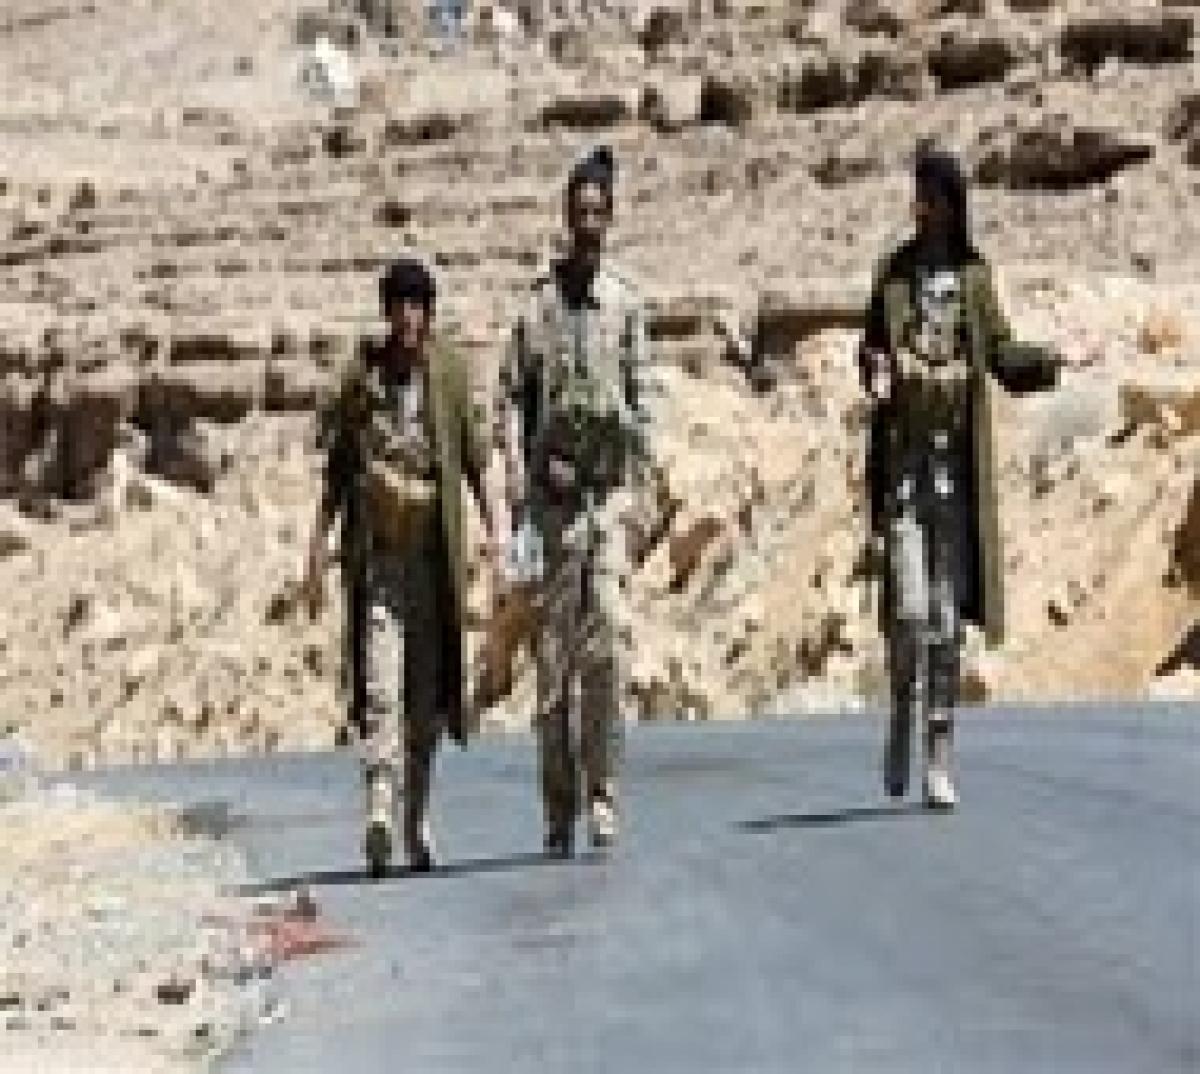 Al-Qaeda country head killed in Pakistan